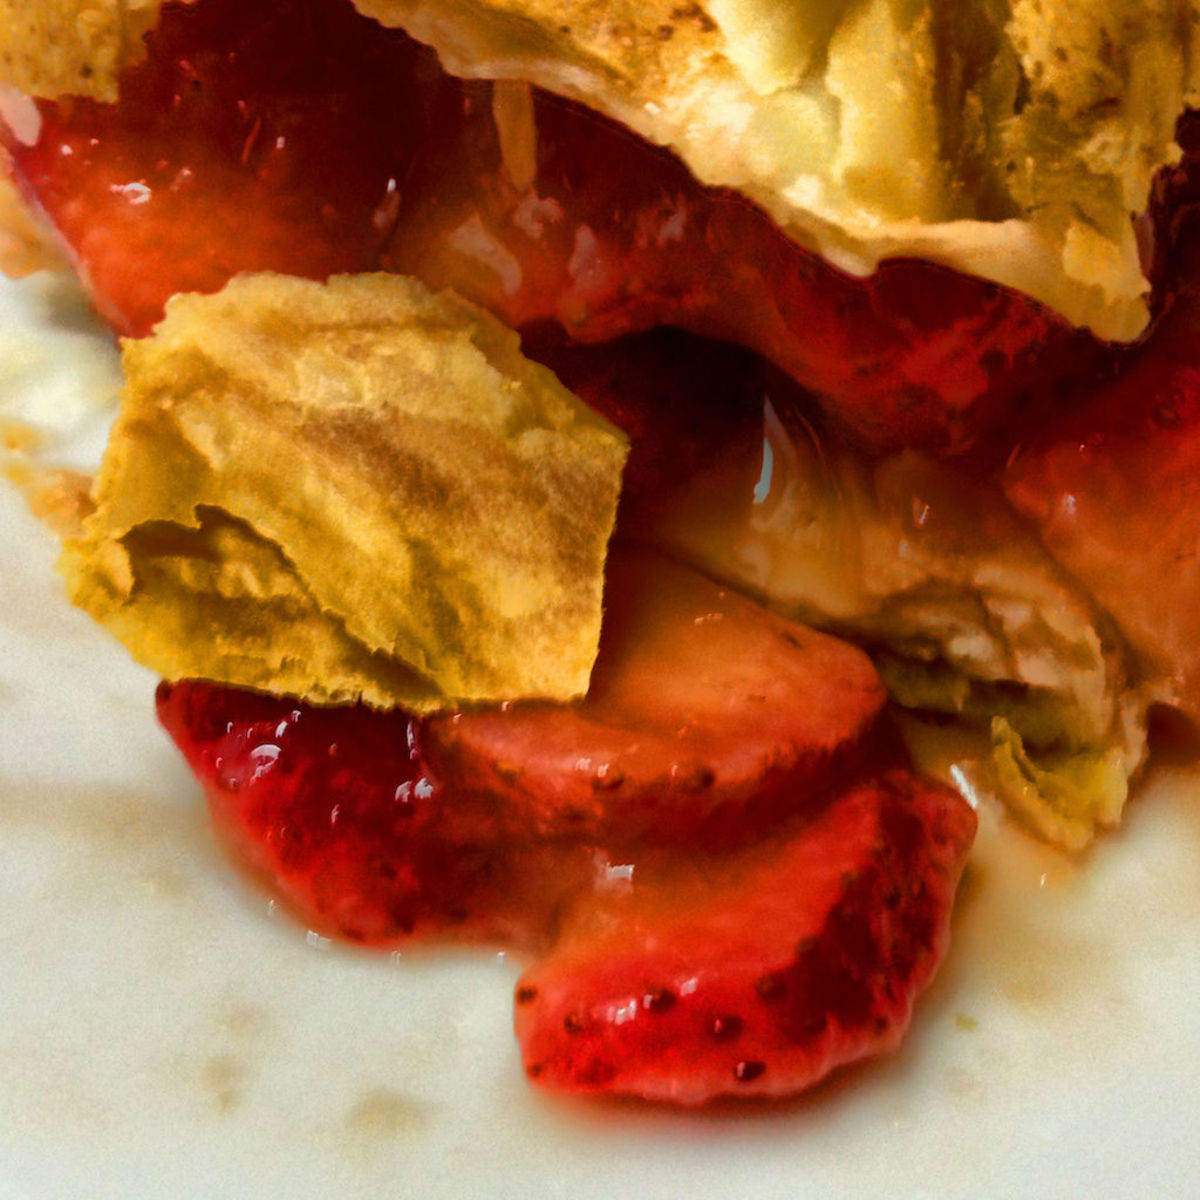 7-up-strawberry-pie-recipe